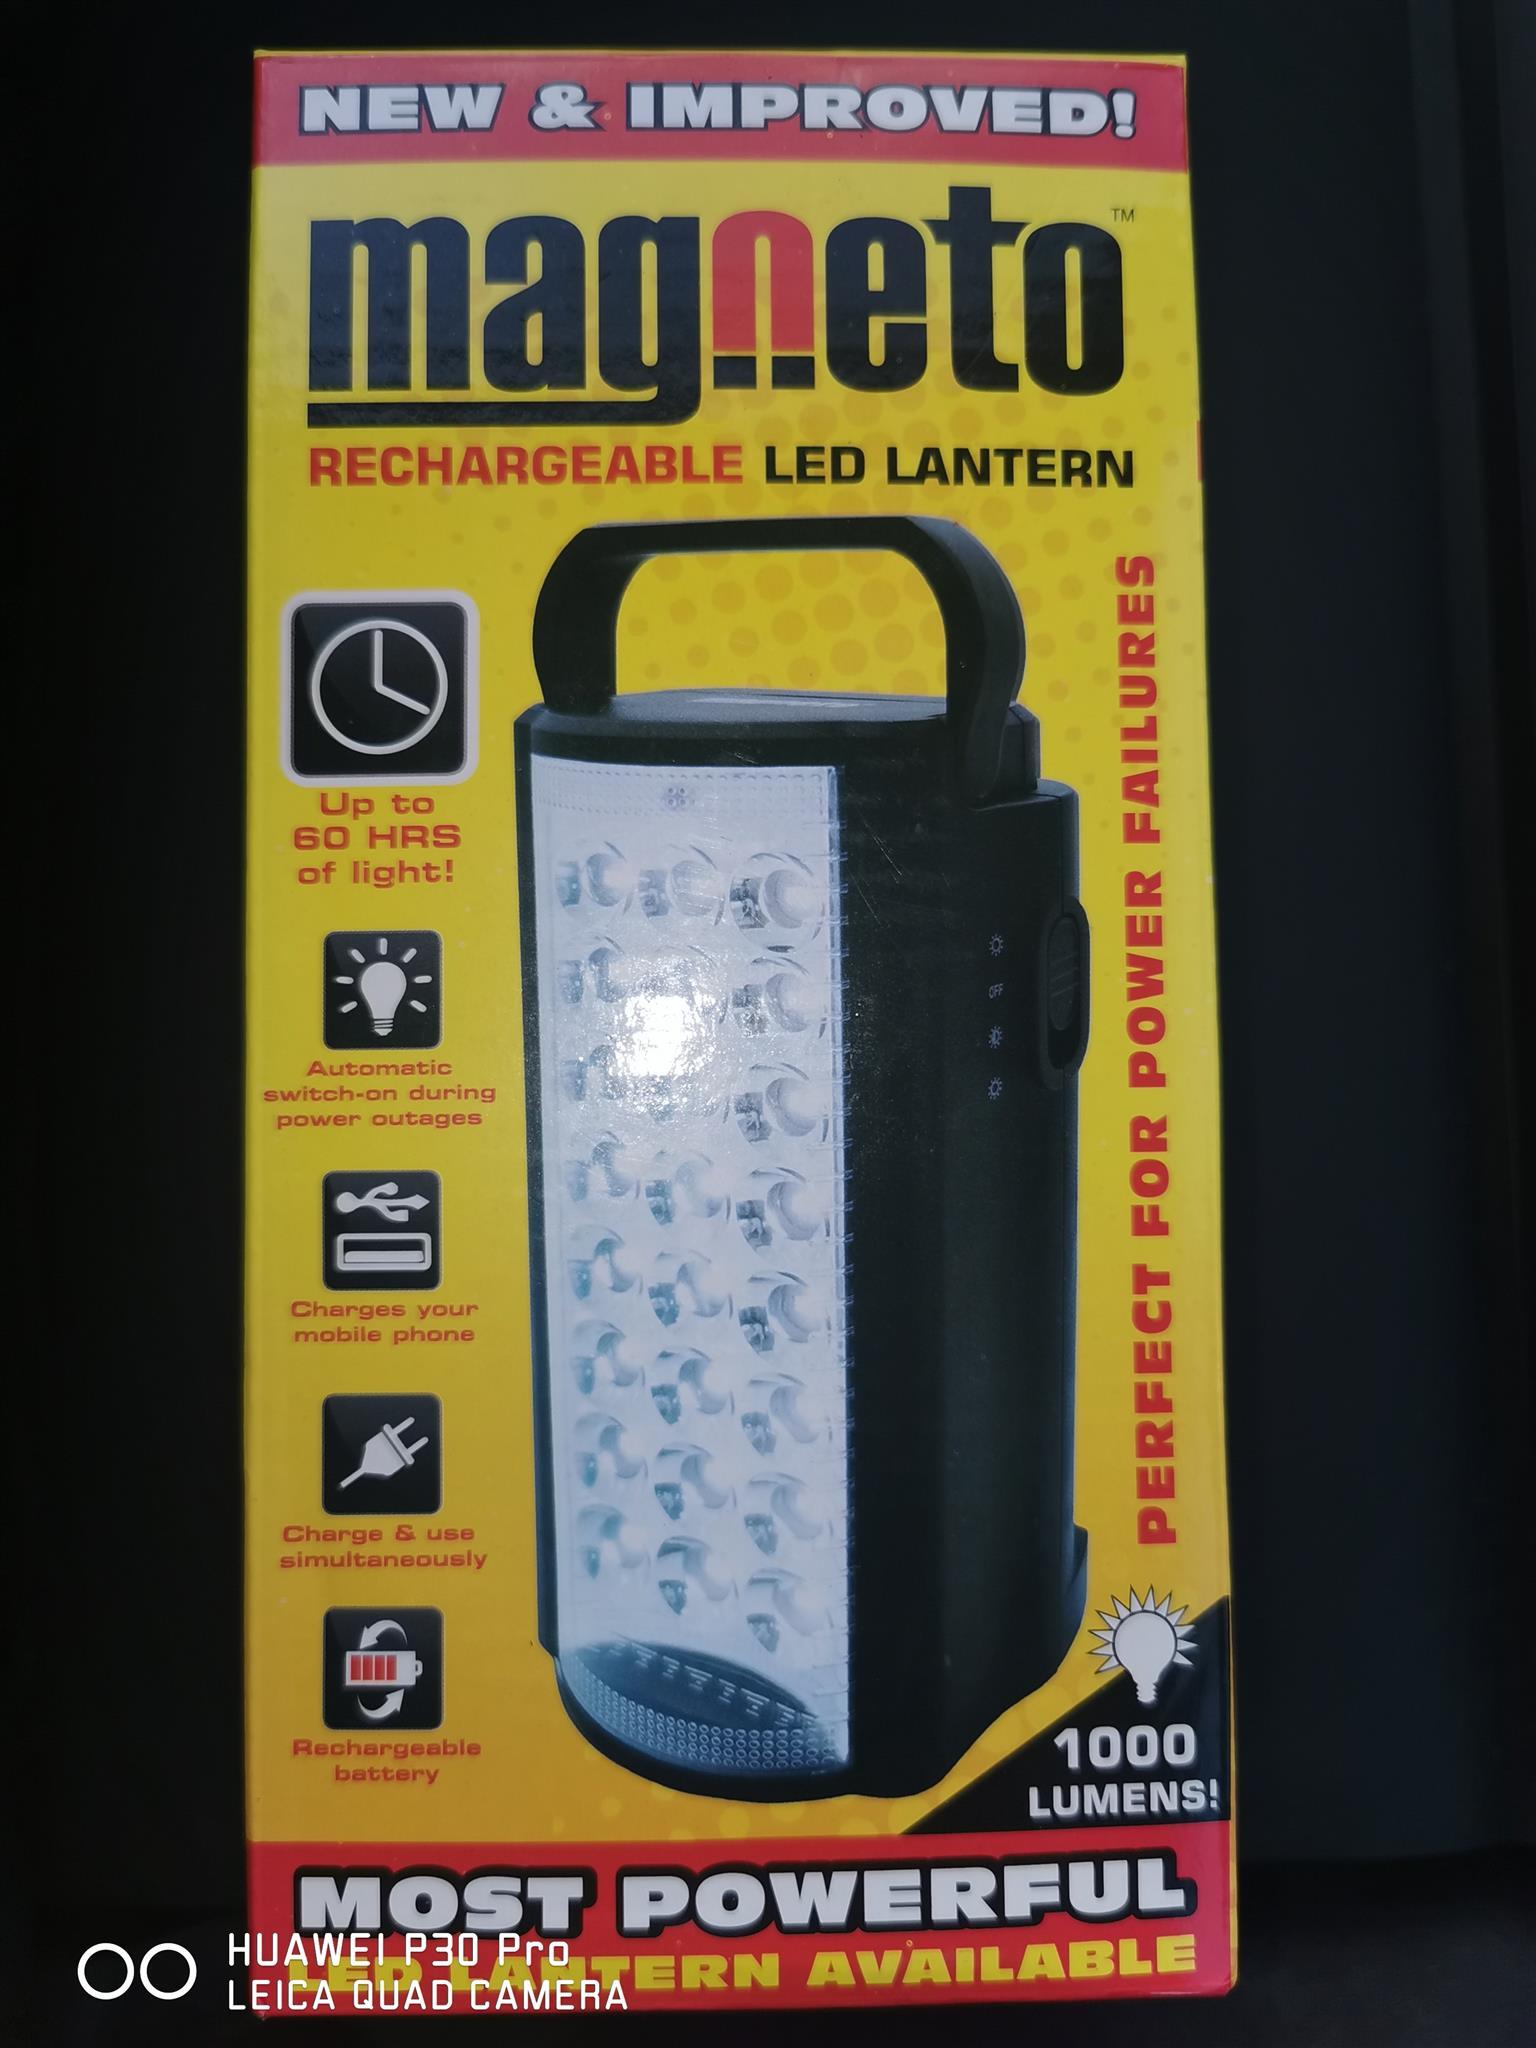 Rechargeable Mobile Led Lantern lights